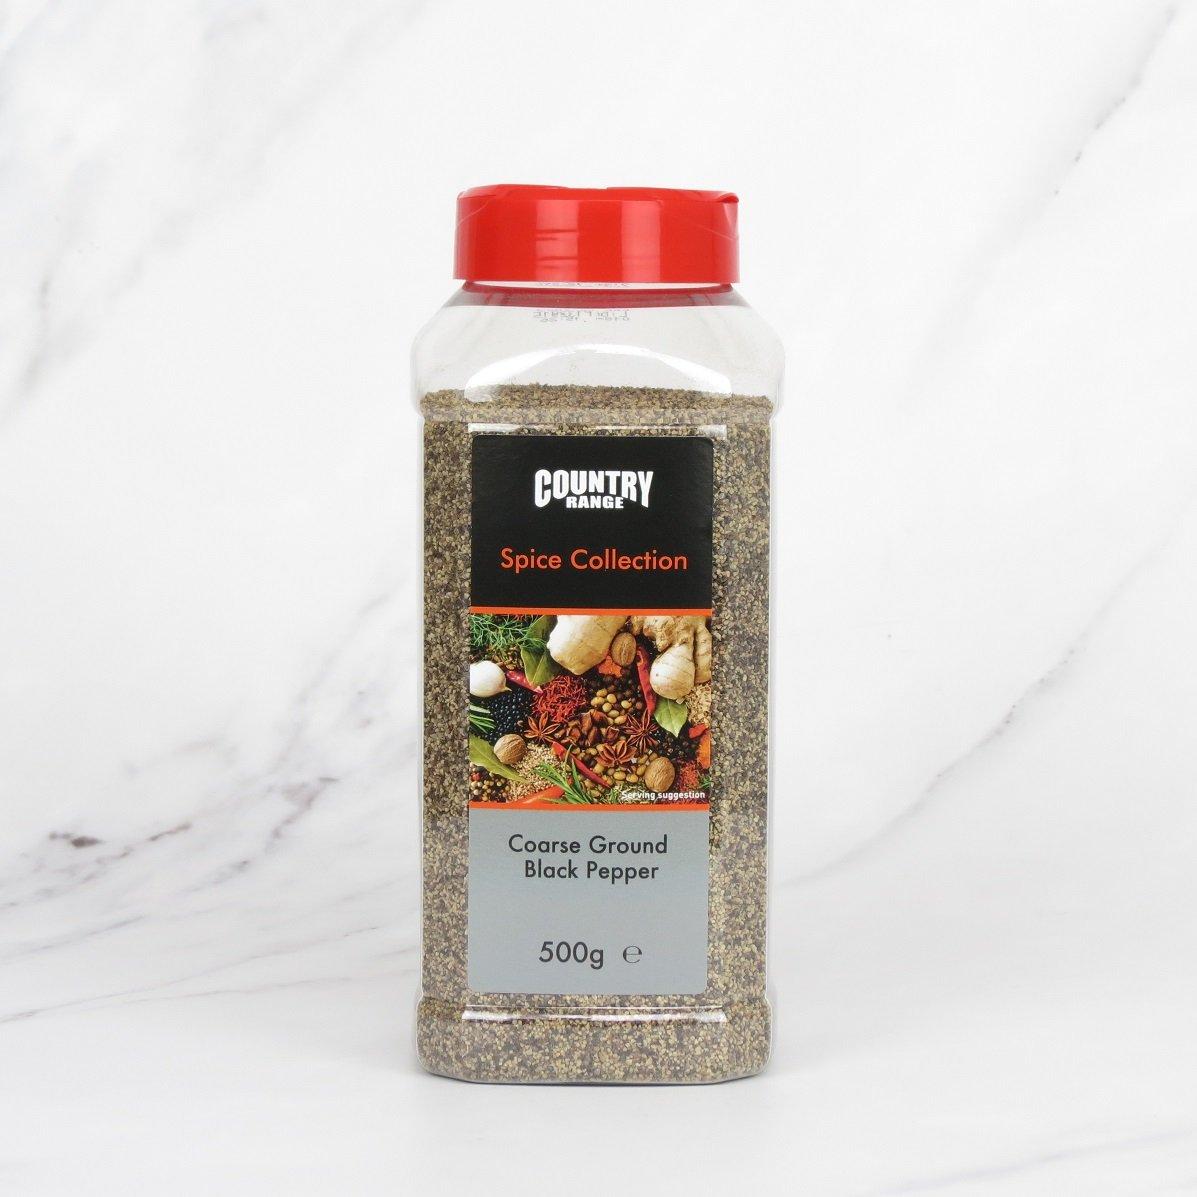 Coarse Ground Black Pepper – 500g